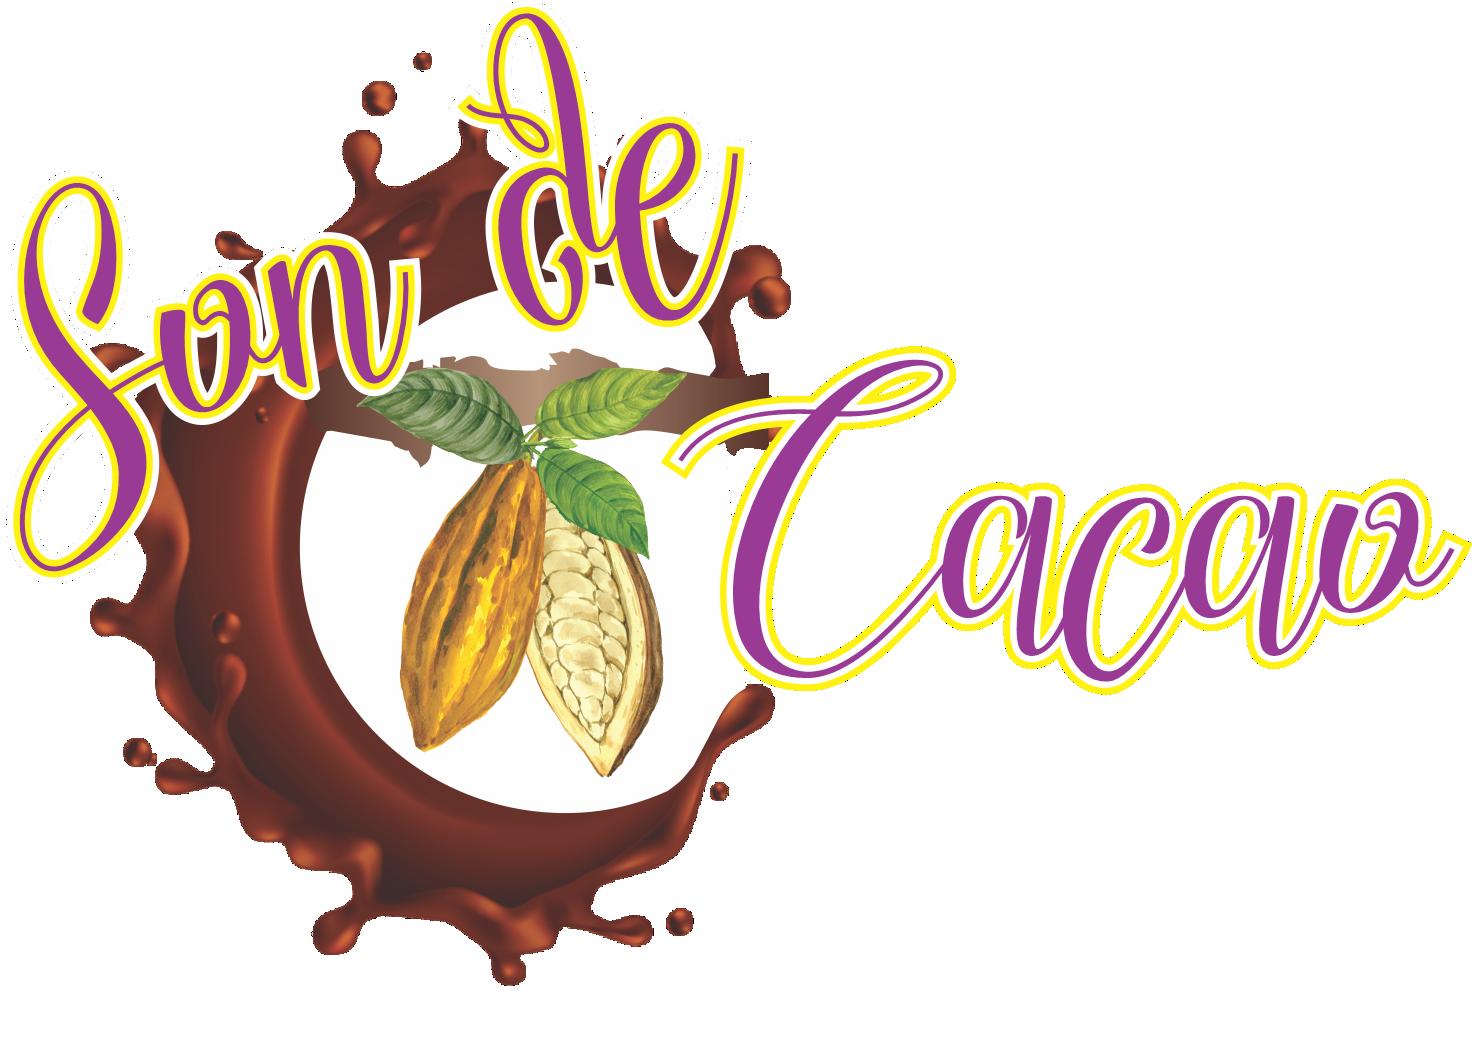 Son de Cacao chocolateria artesanal